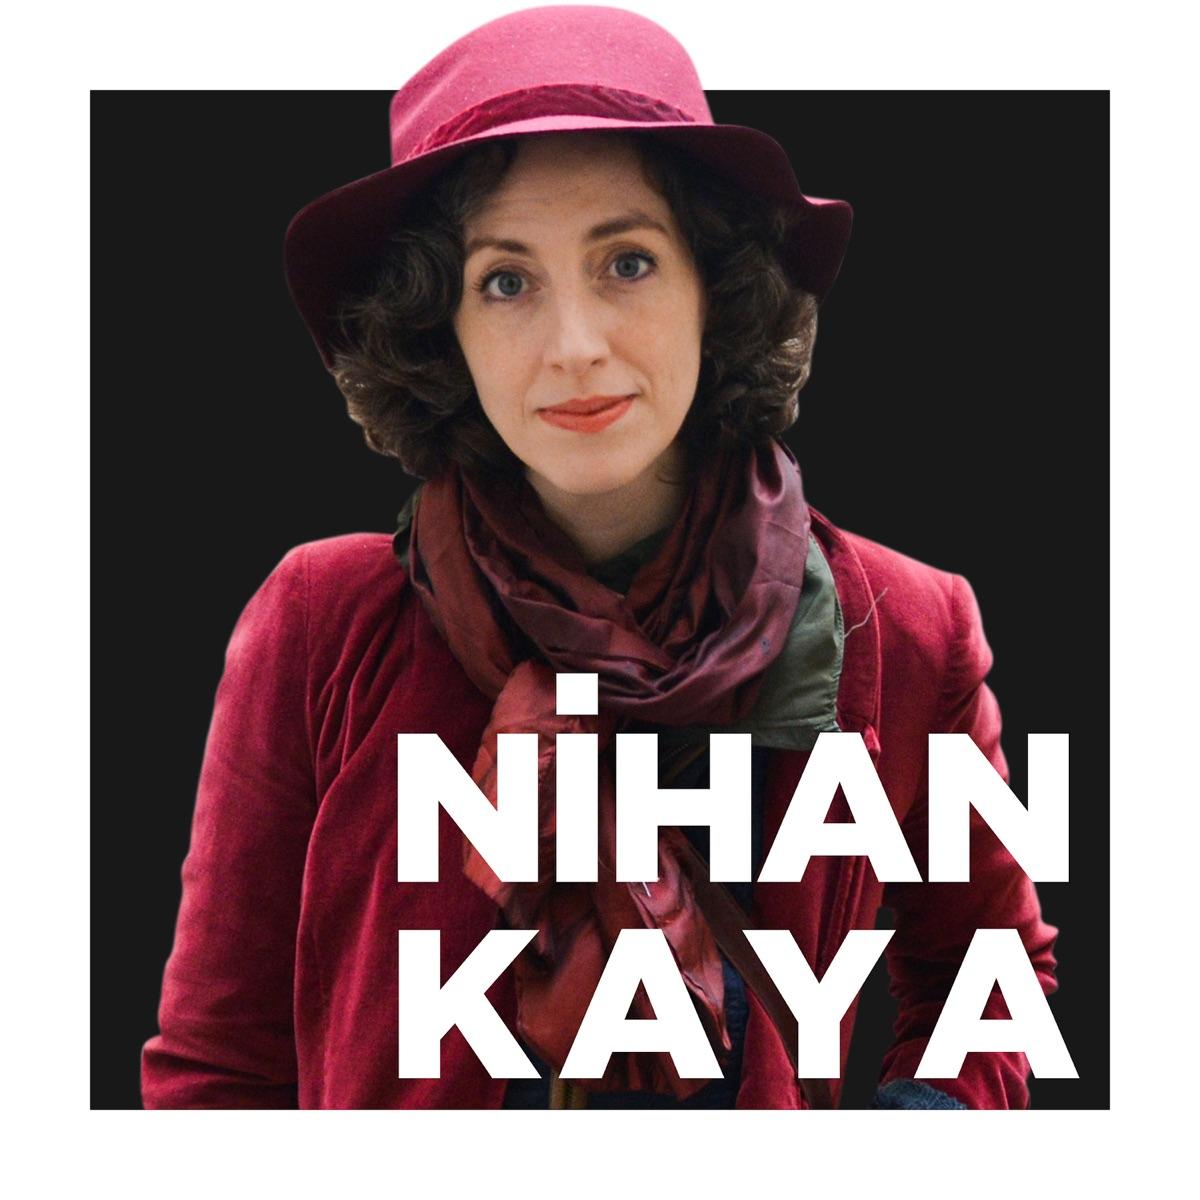 Nihan Kaya